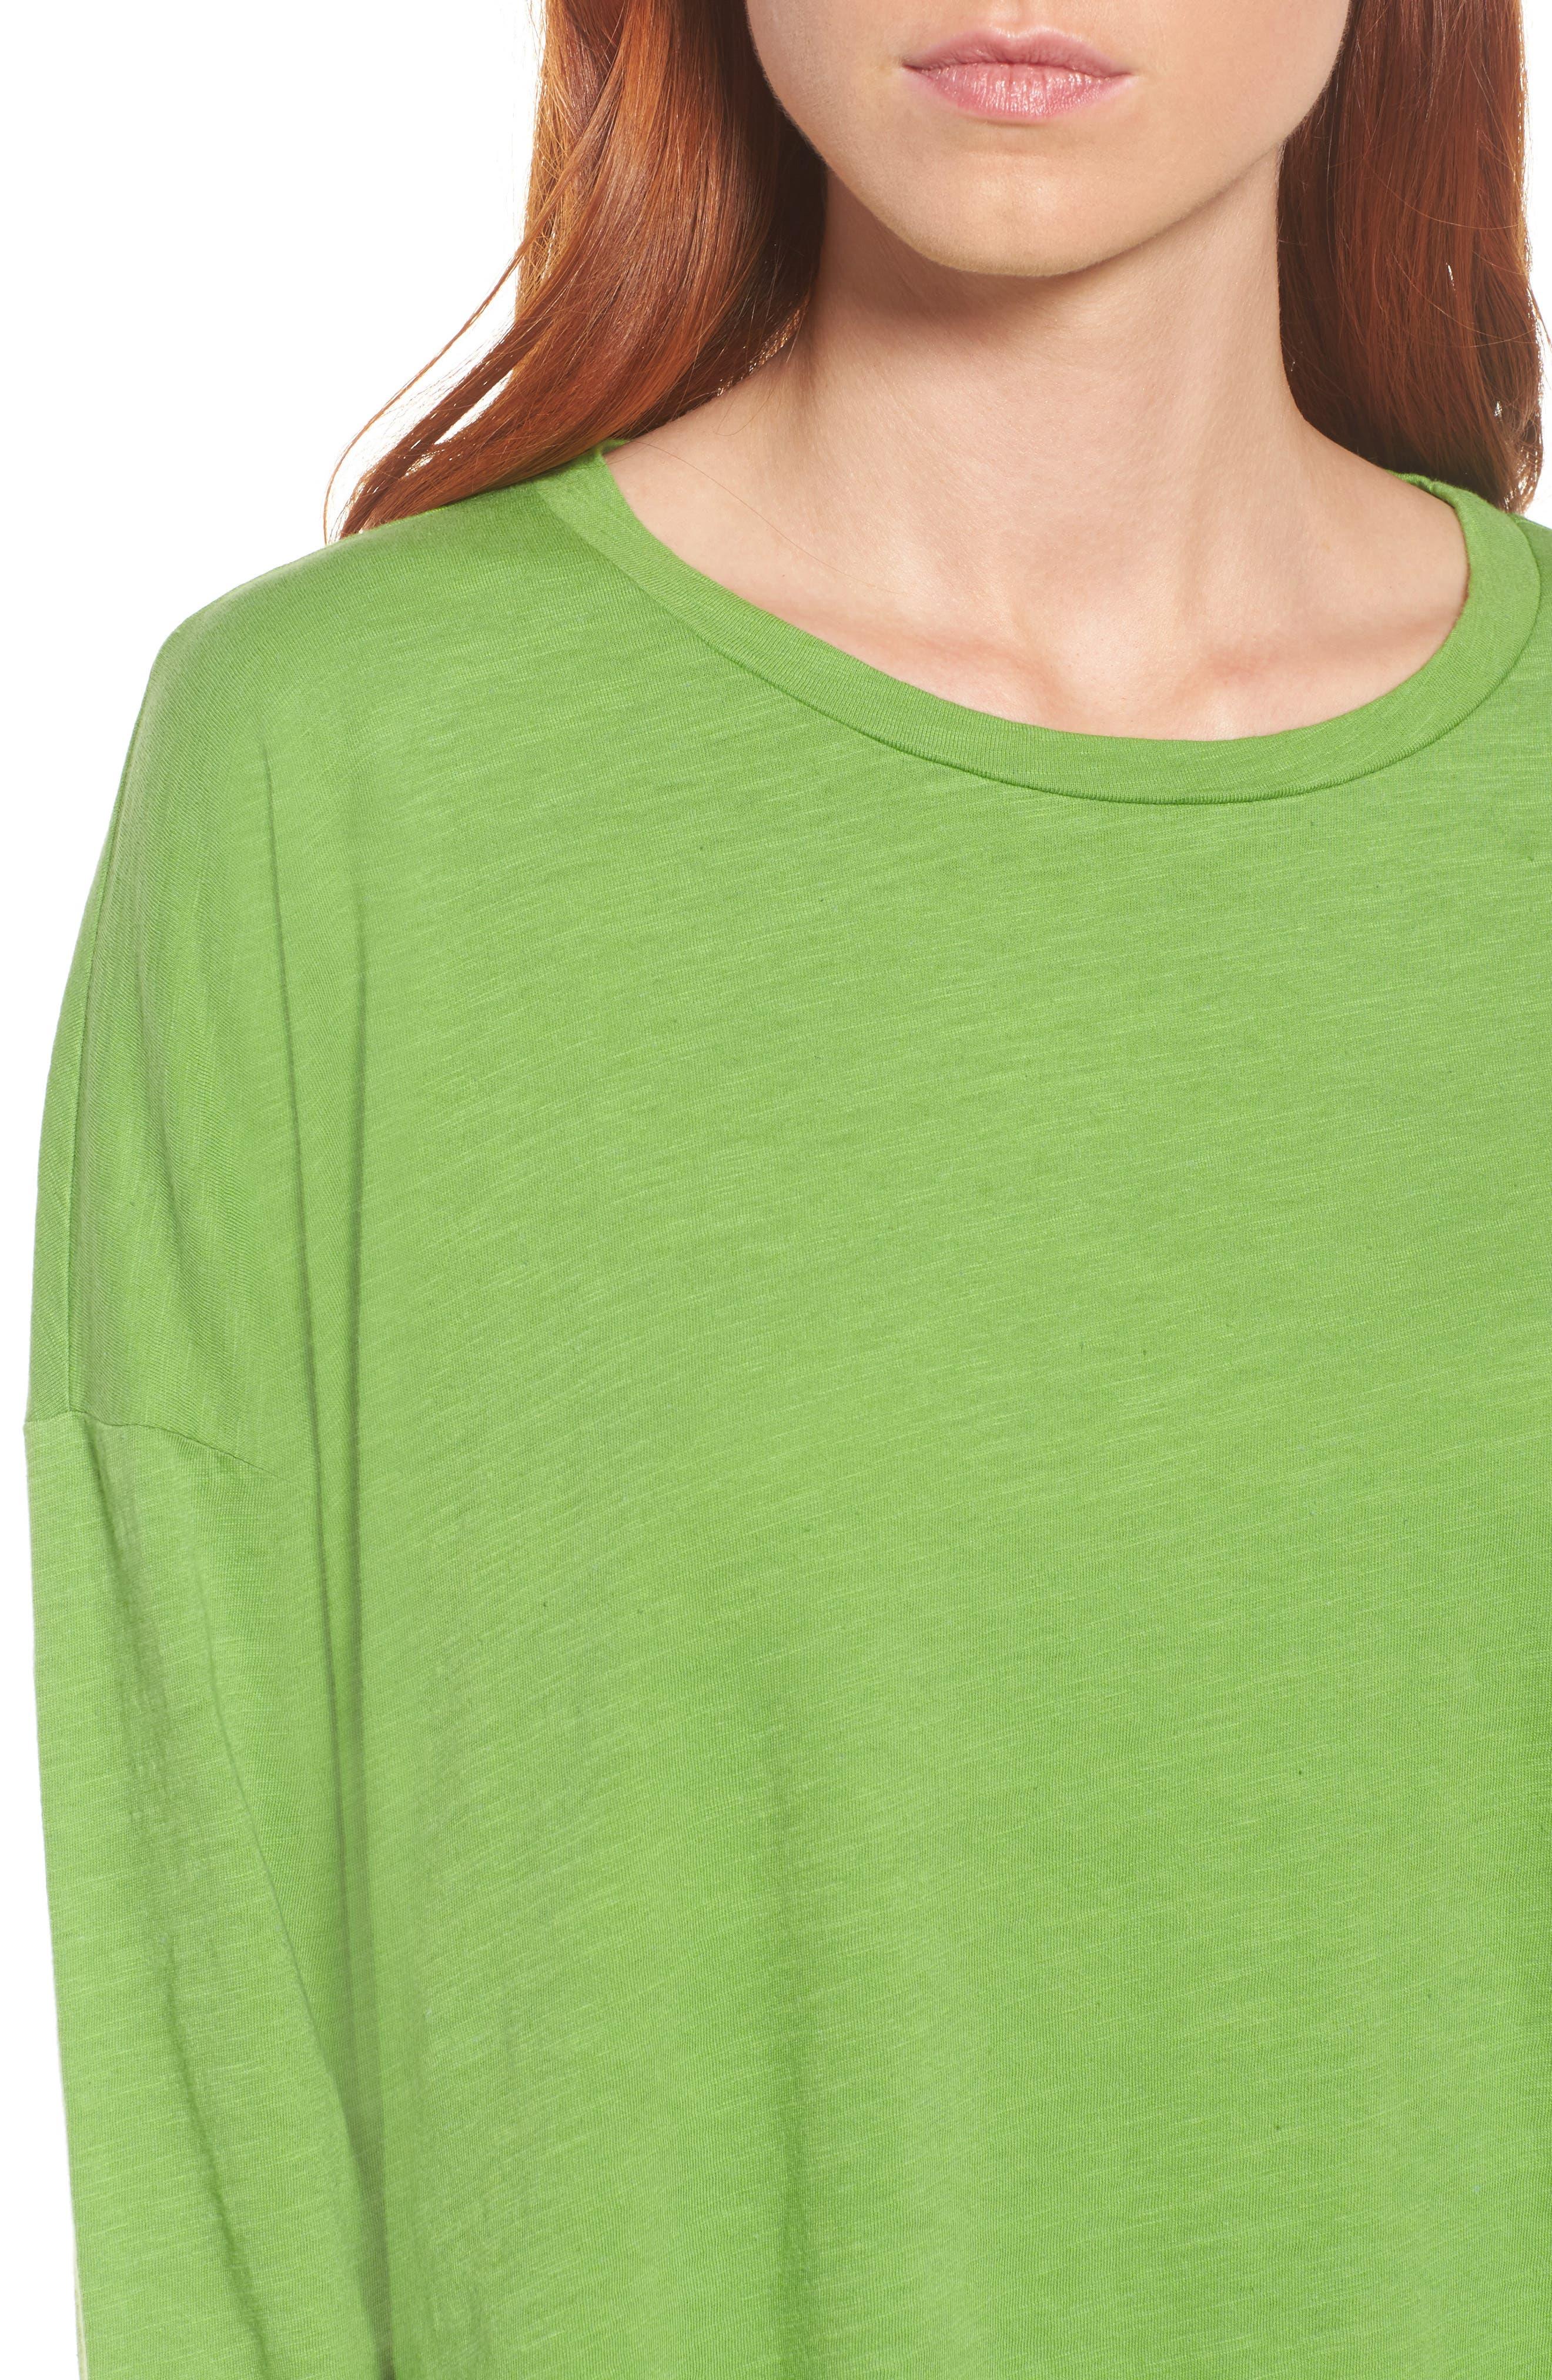 Organic Cotton Knit Top,                             Alternate thumbnail 30, color,